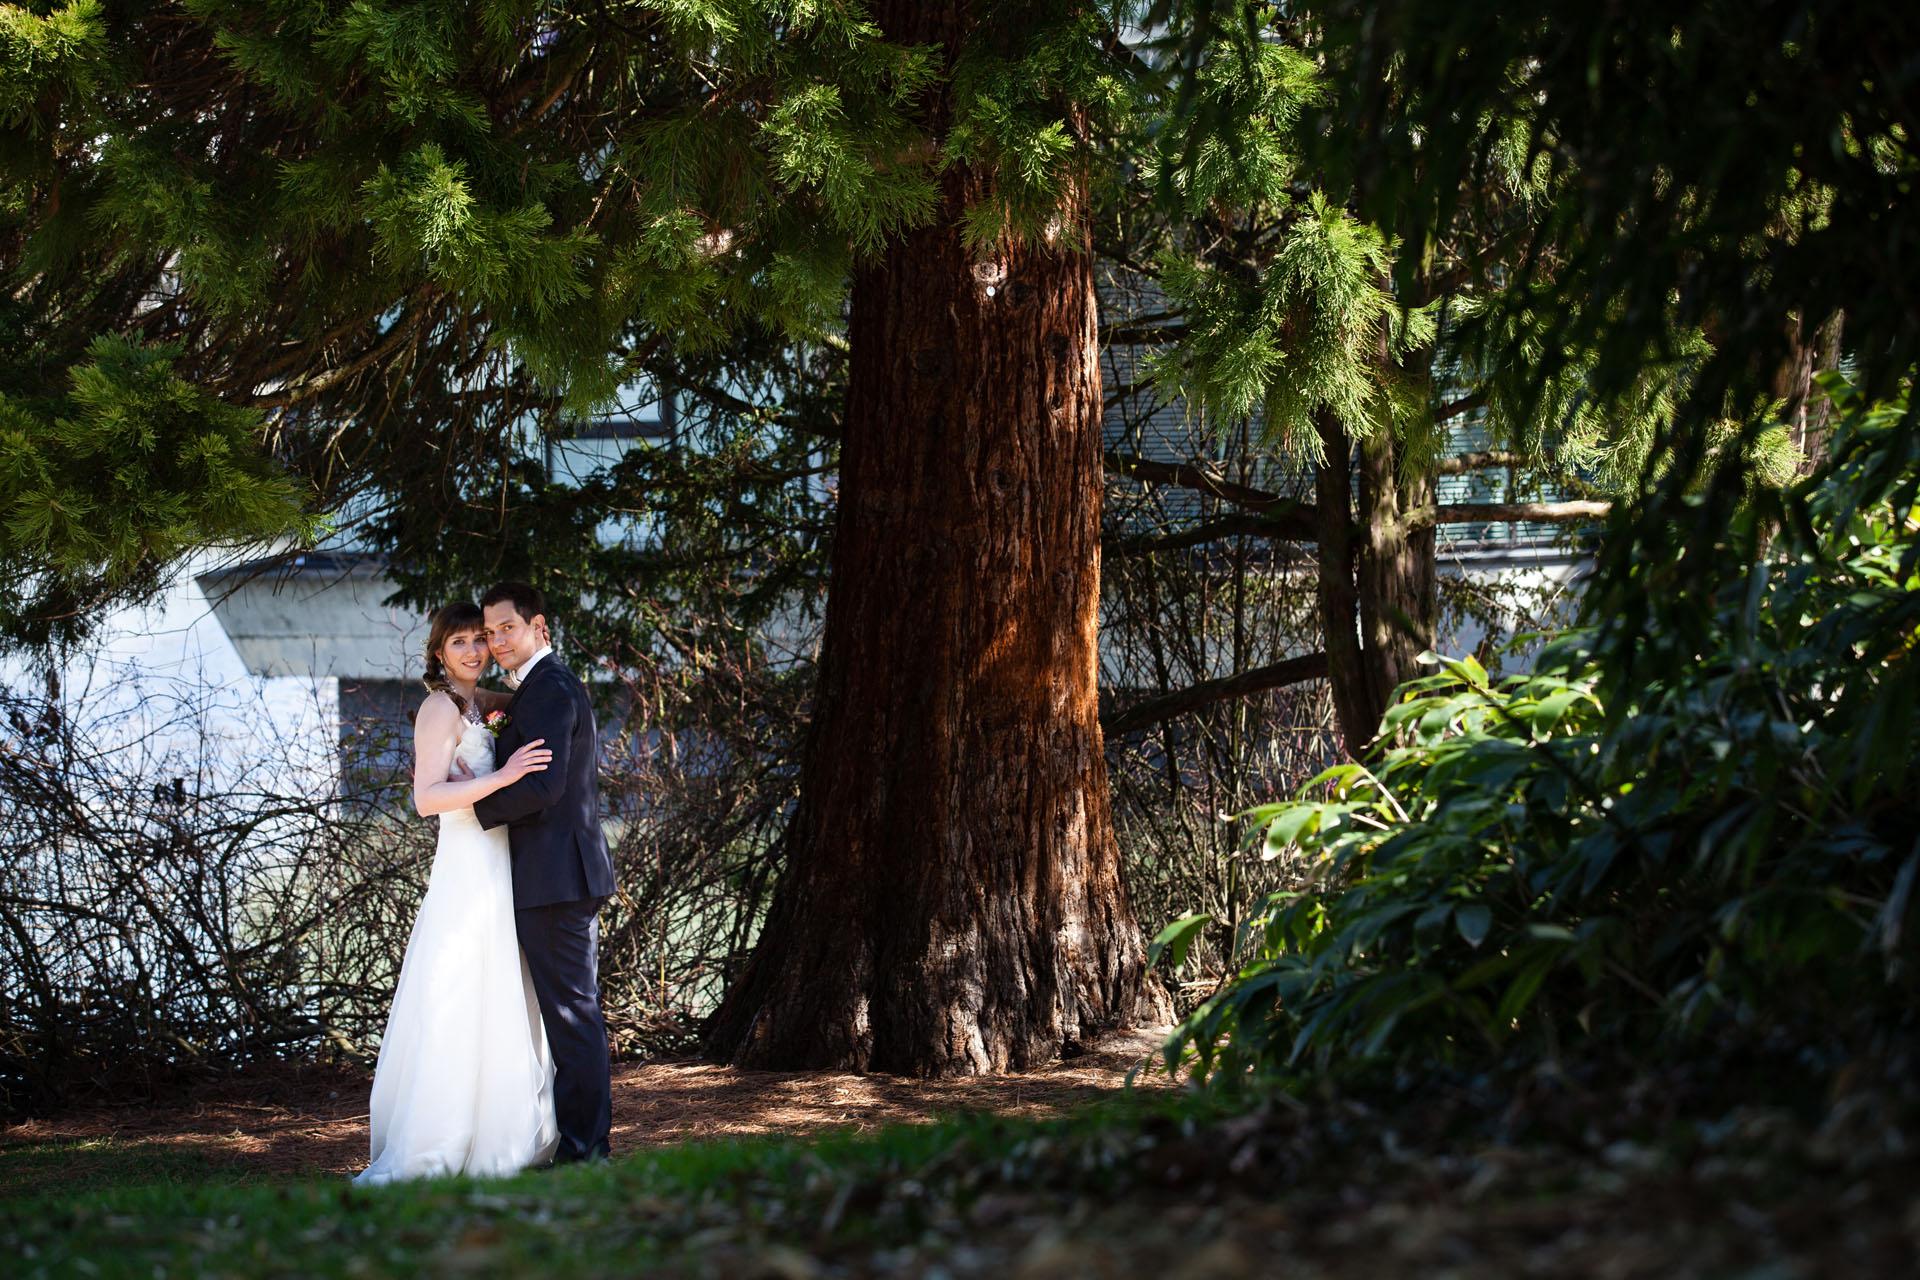 Hochzeitsfotografie in Böblingen im Stadtpark